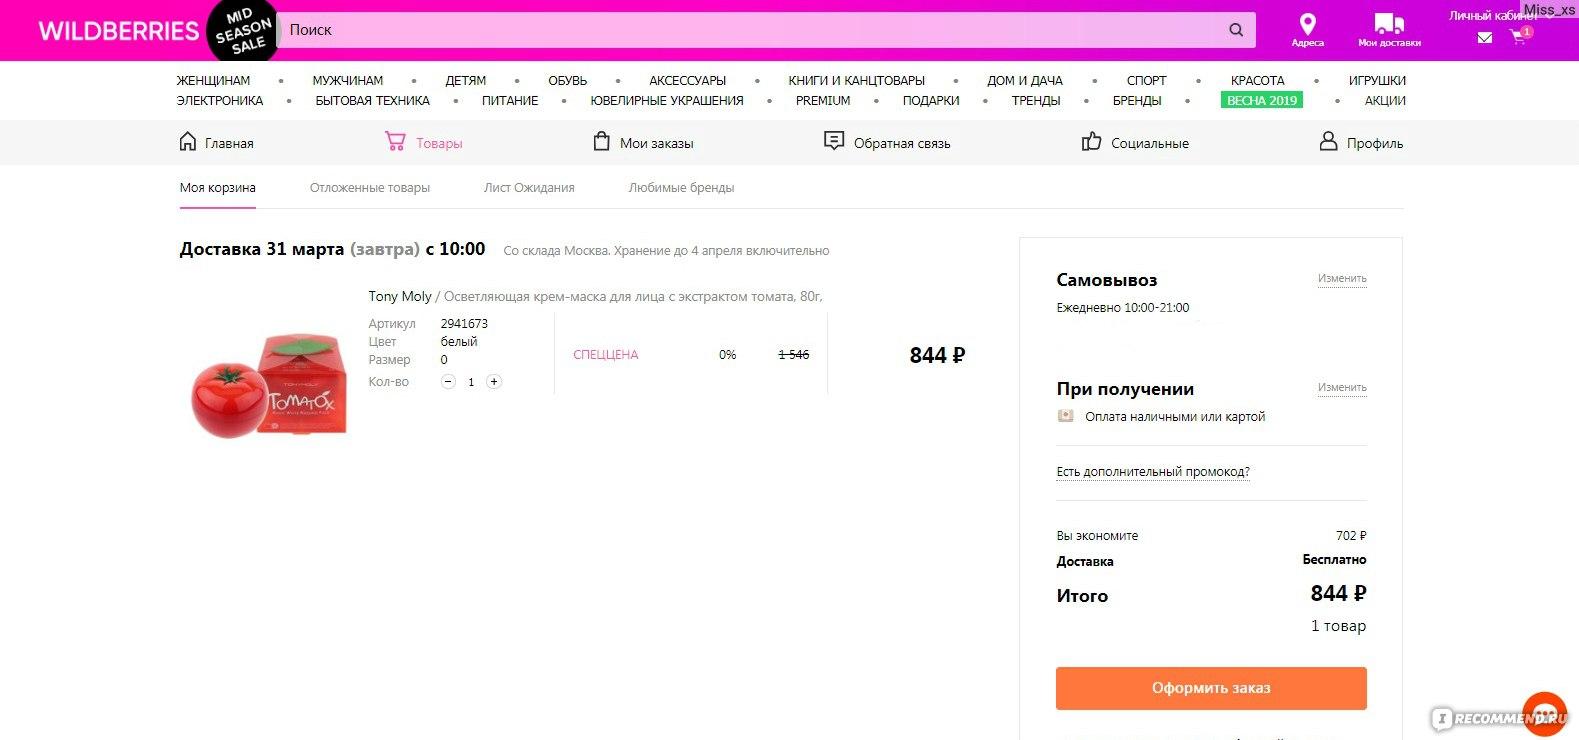 65f477b0 Wildberries.ru - Интернет-магазин модной одежды и обуви - «2 месяца ...